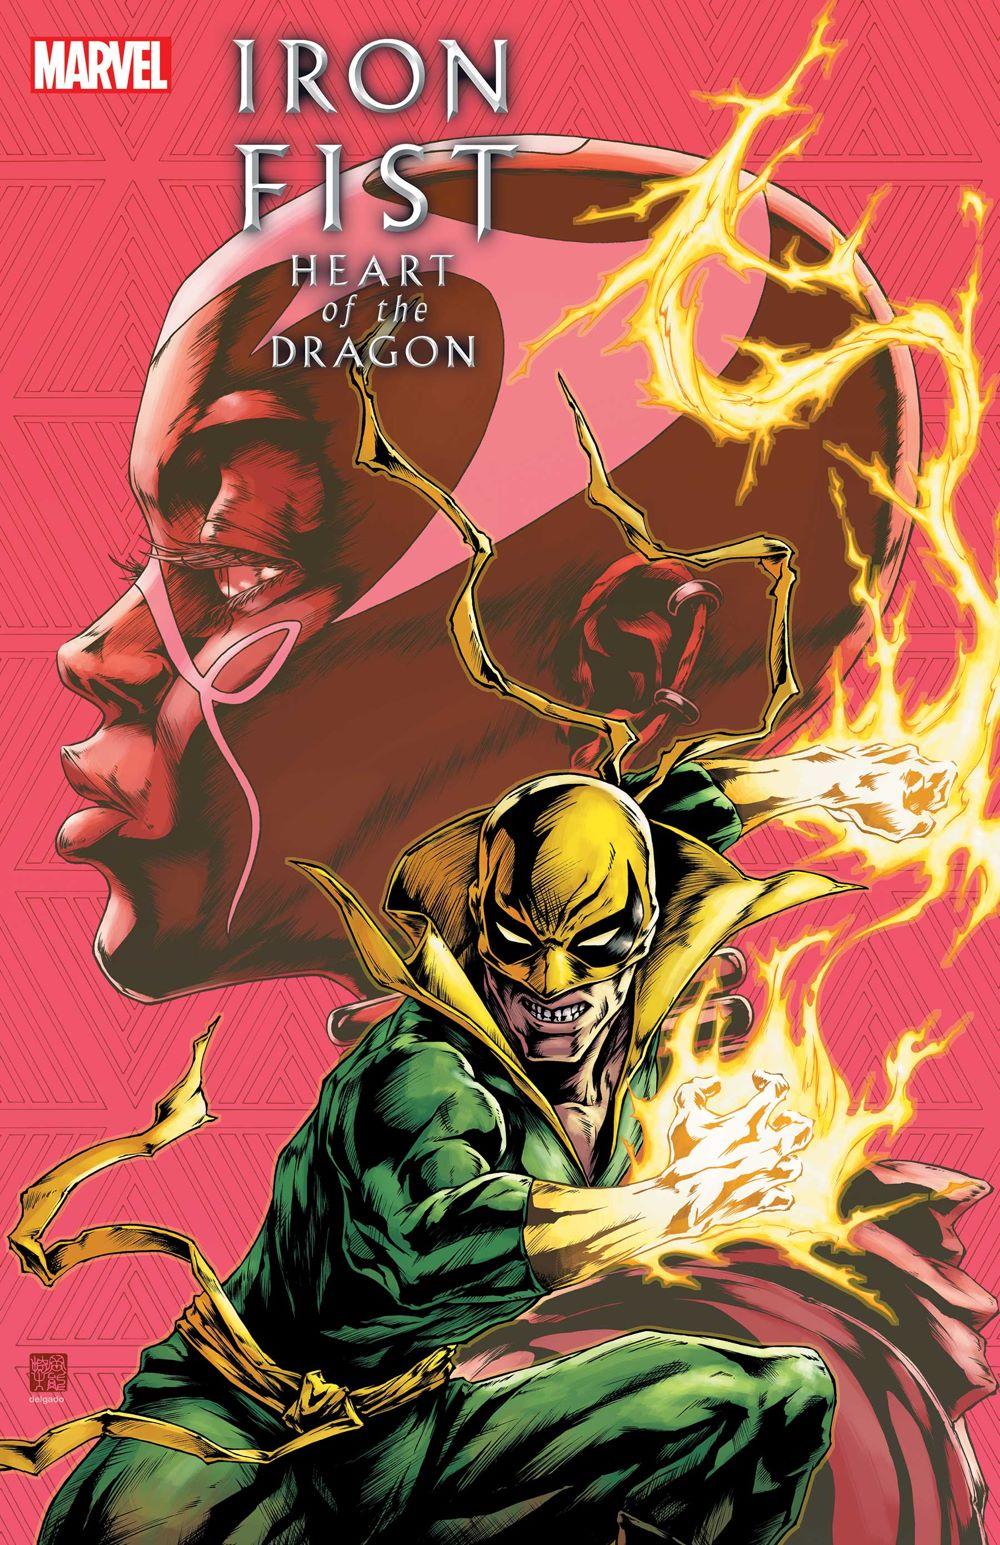 IRONFISTHOD2021006_Okazaki_Var Marvel Comics June 2021 Solicitations